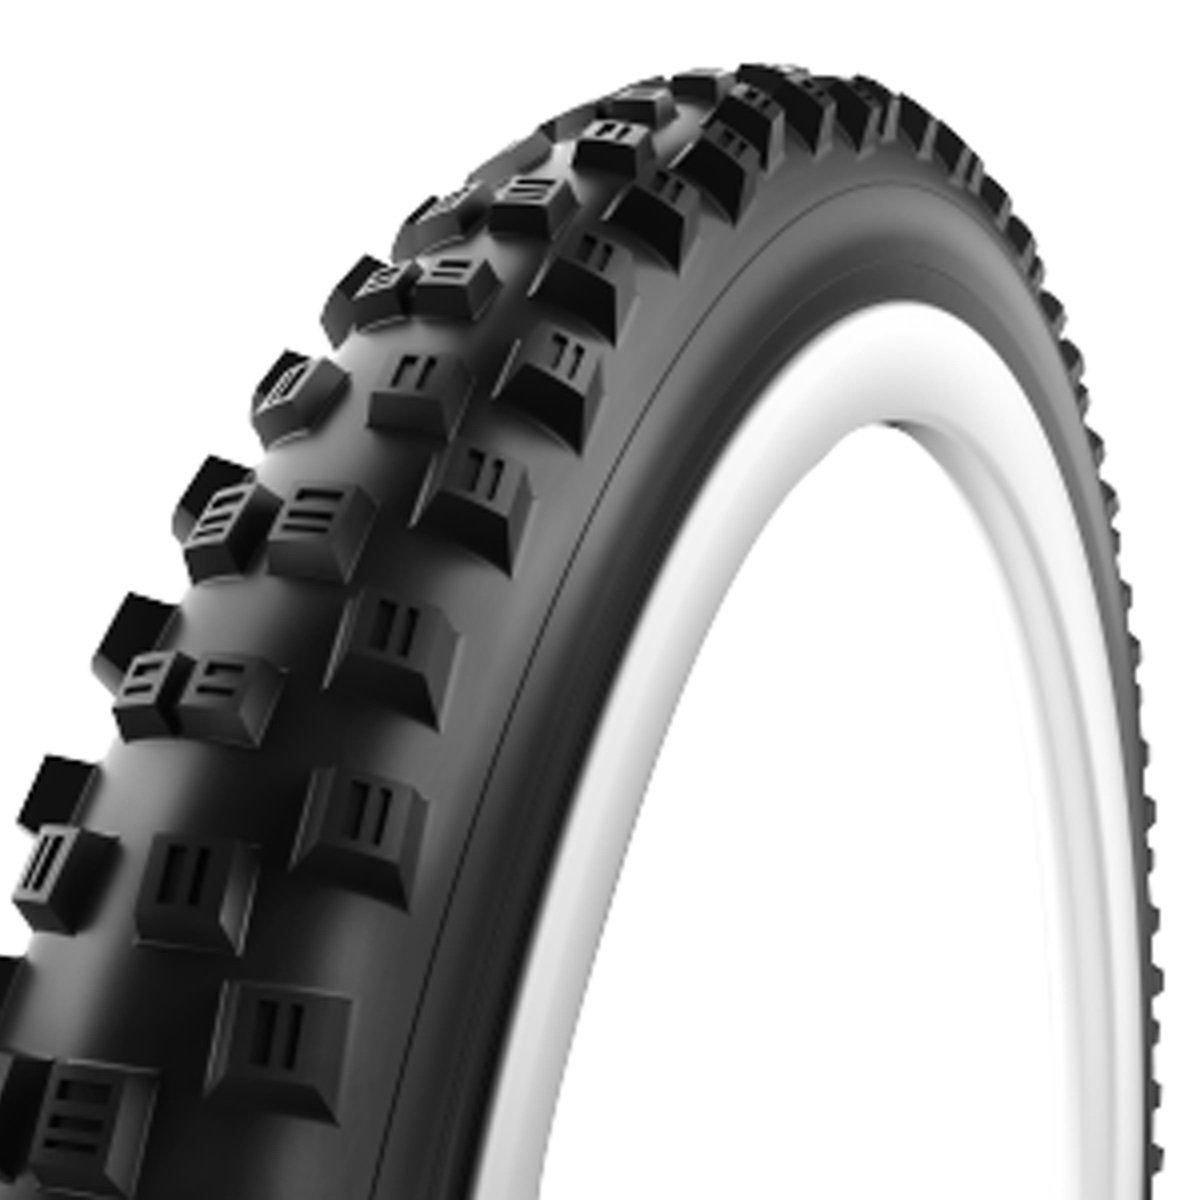 Vittoria Mota TNT G +すべてのマウンテン自転車タイヤ B0768PD43Danth/blk/blk 27.5x2.35